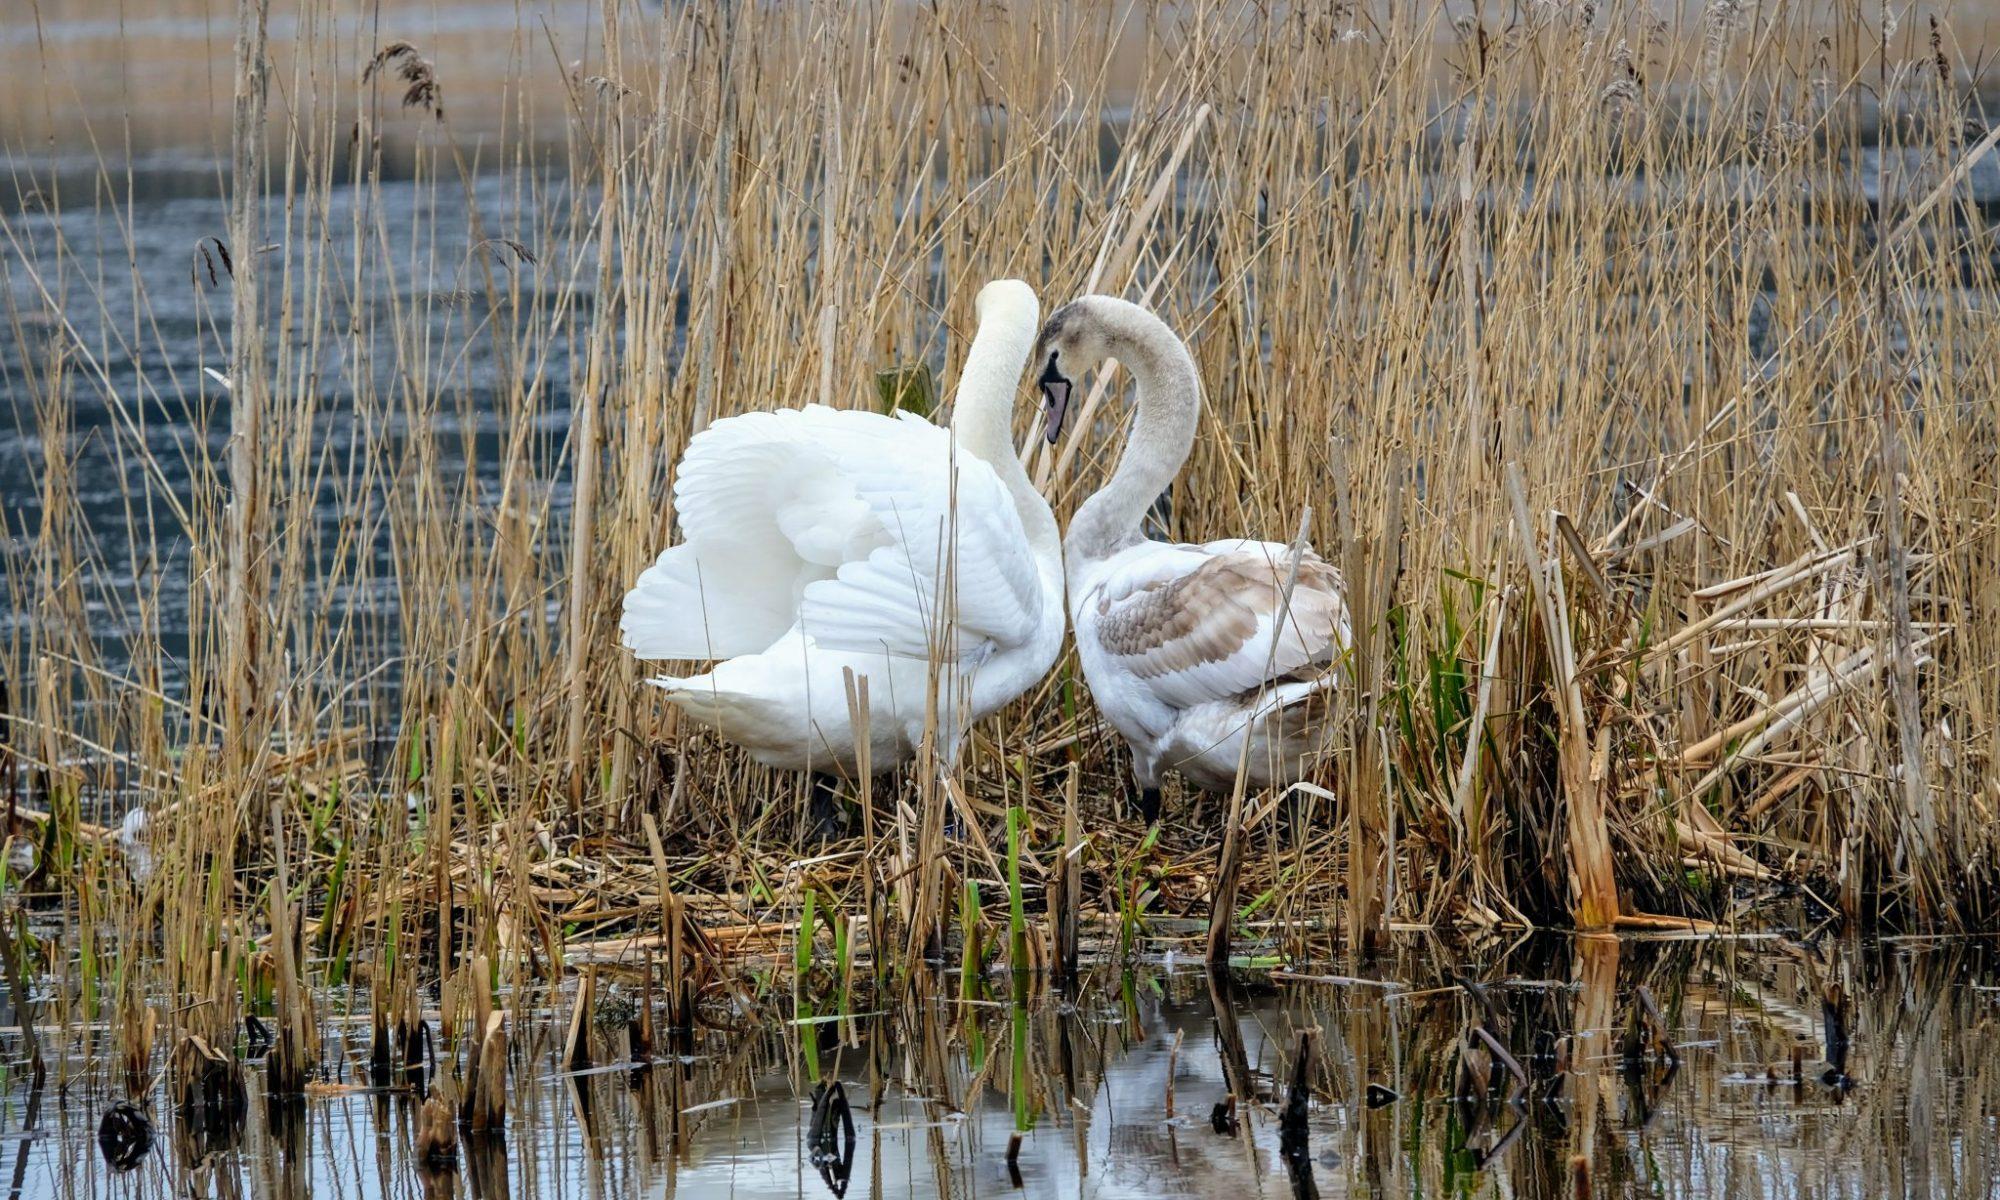 Swans at RSPB Leighton Moss